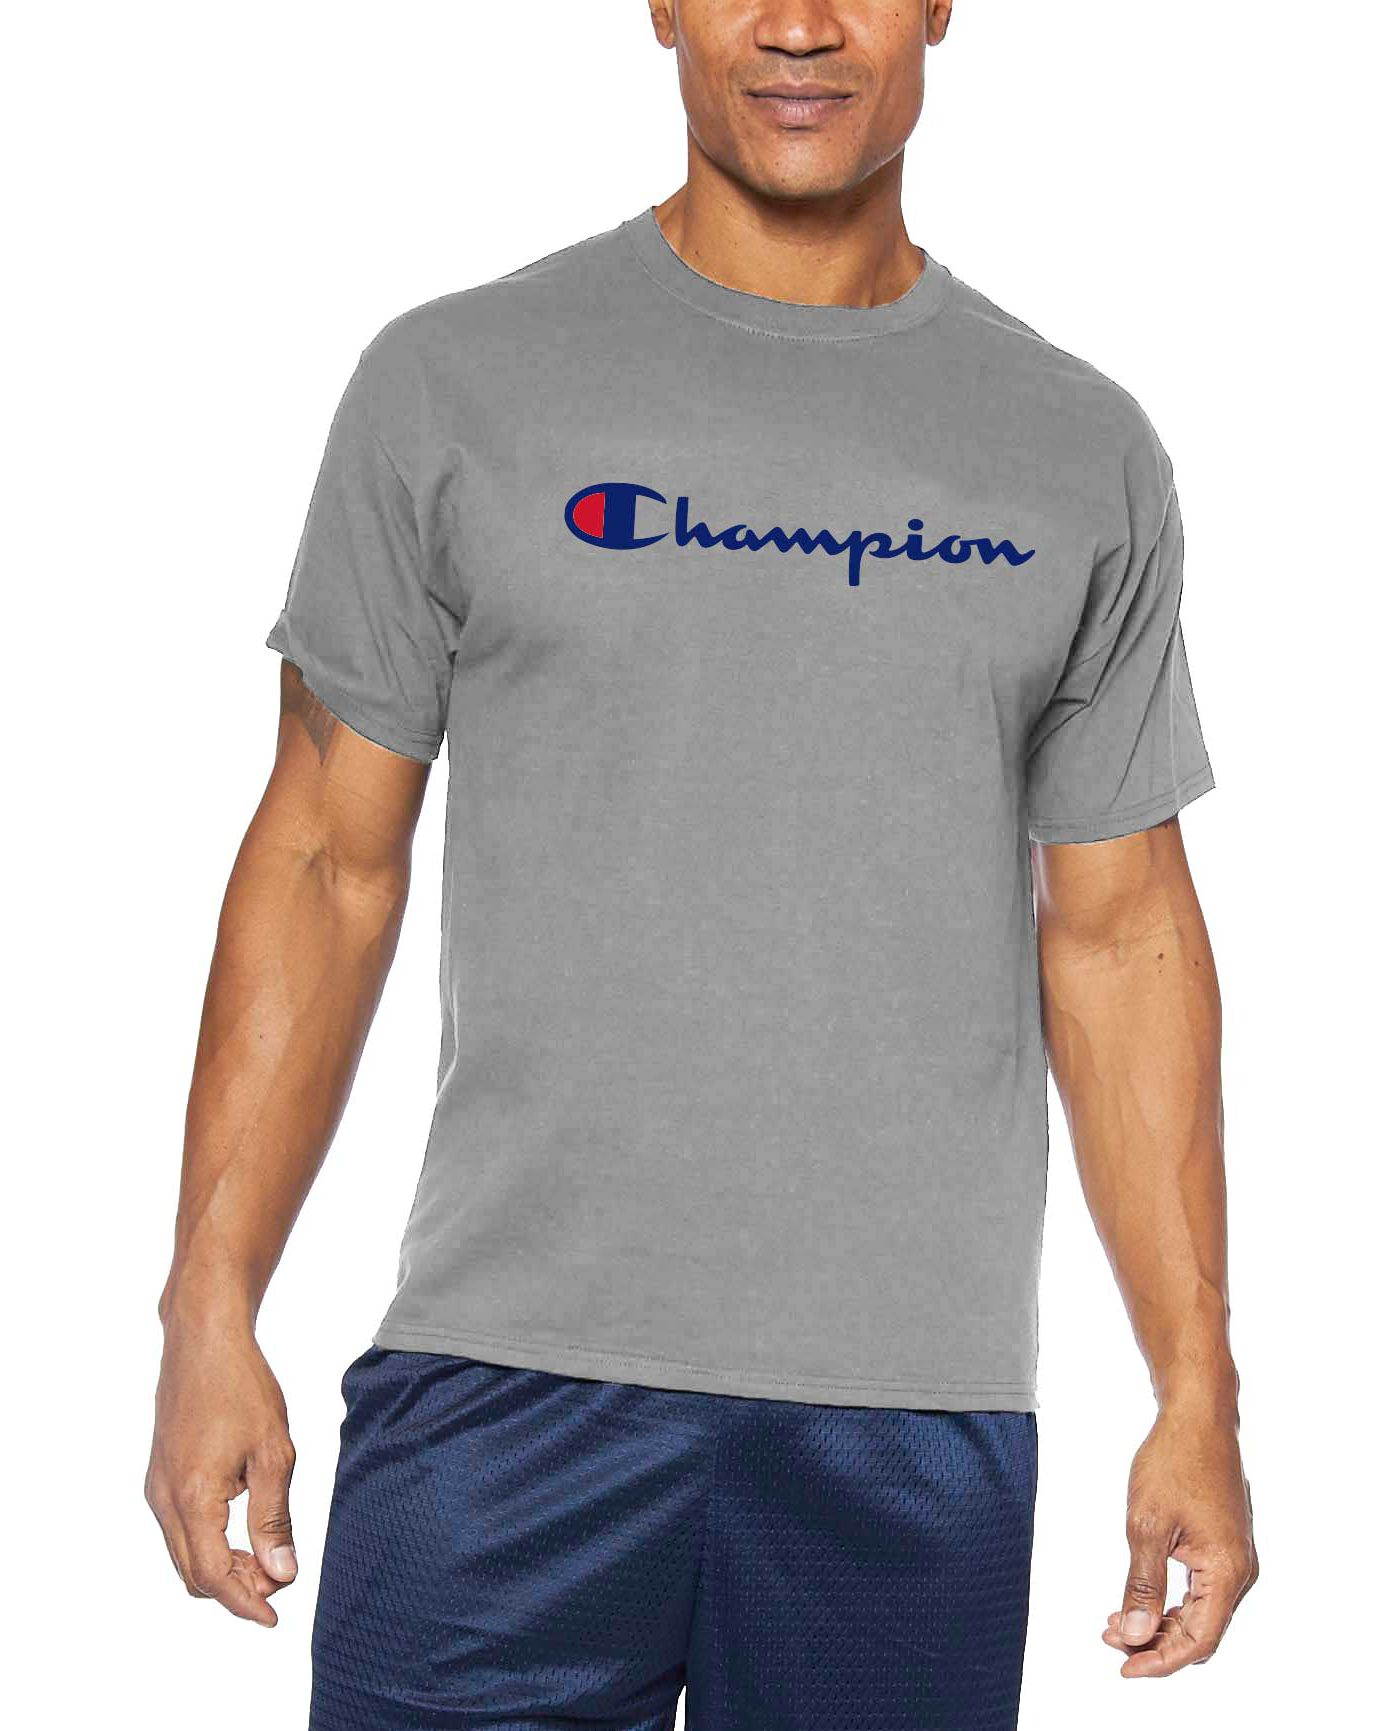 Champion Men's Big & Tall Script Graphic Tee (Regular and Big & Tall)